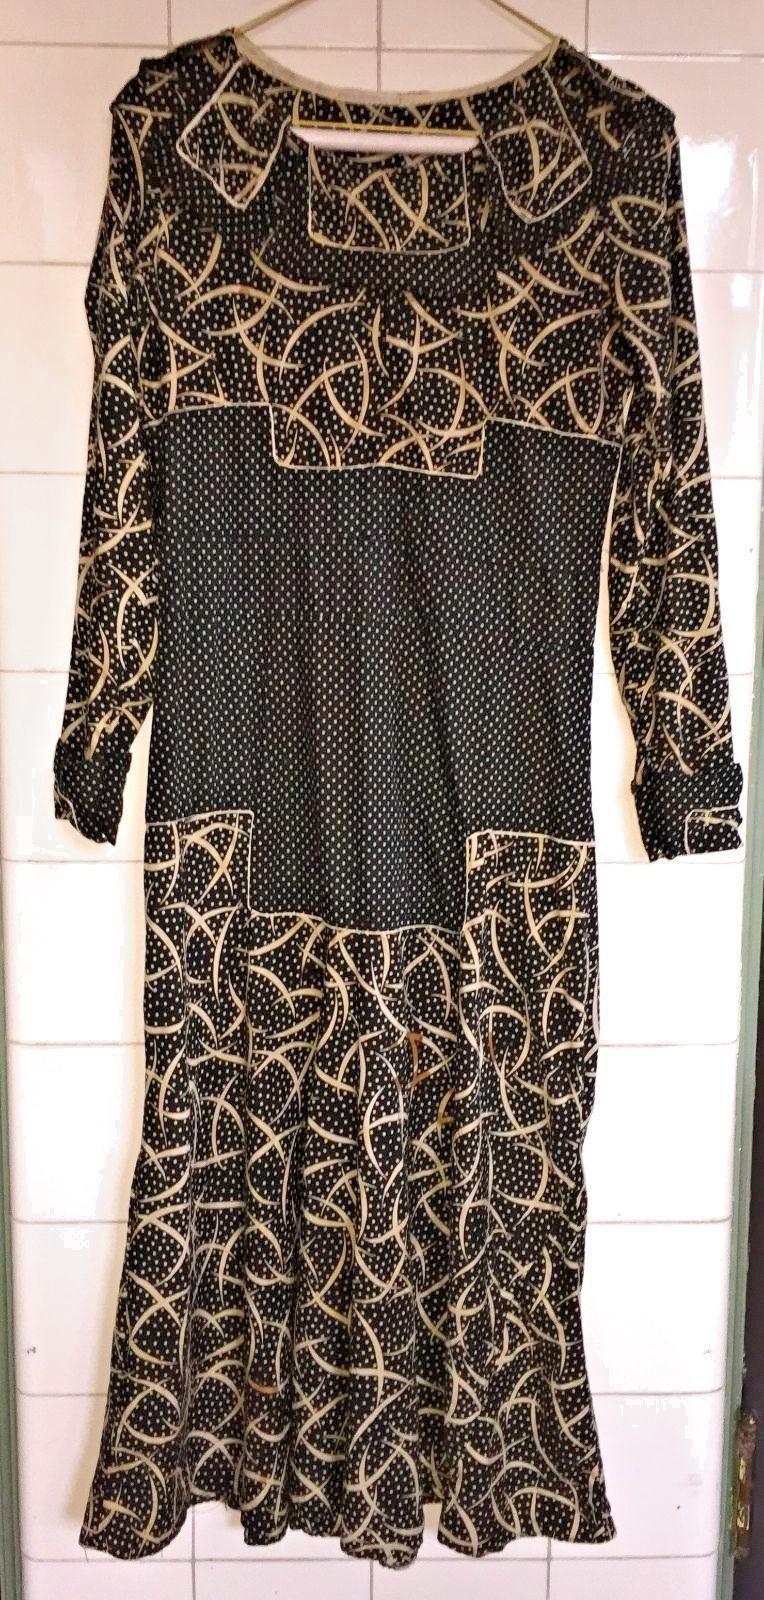 Vintage 1920s 20s Art Deco Black Ivory Cotton Day Dress | eBay